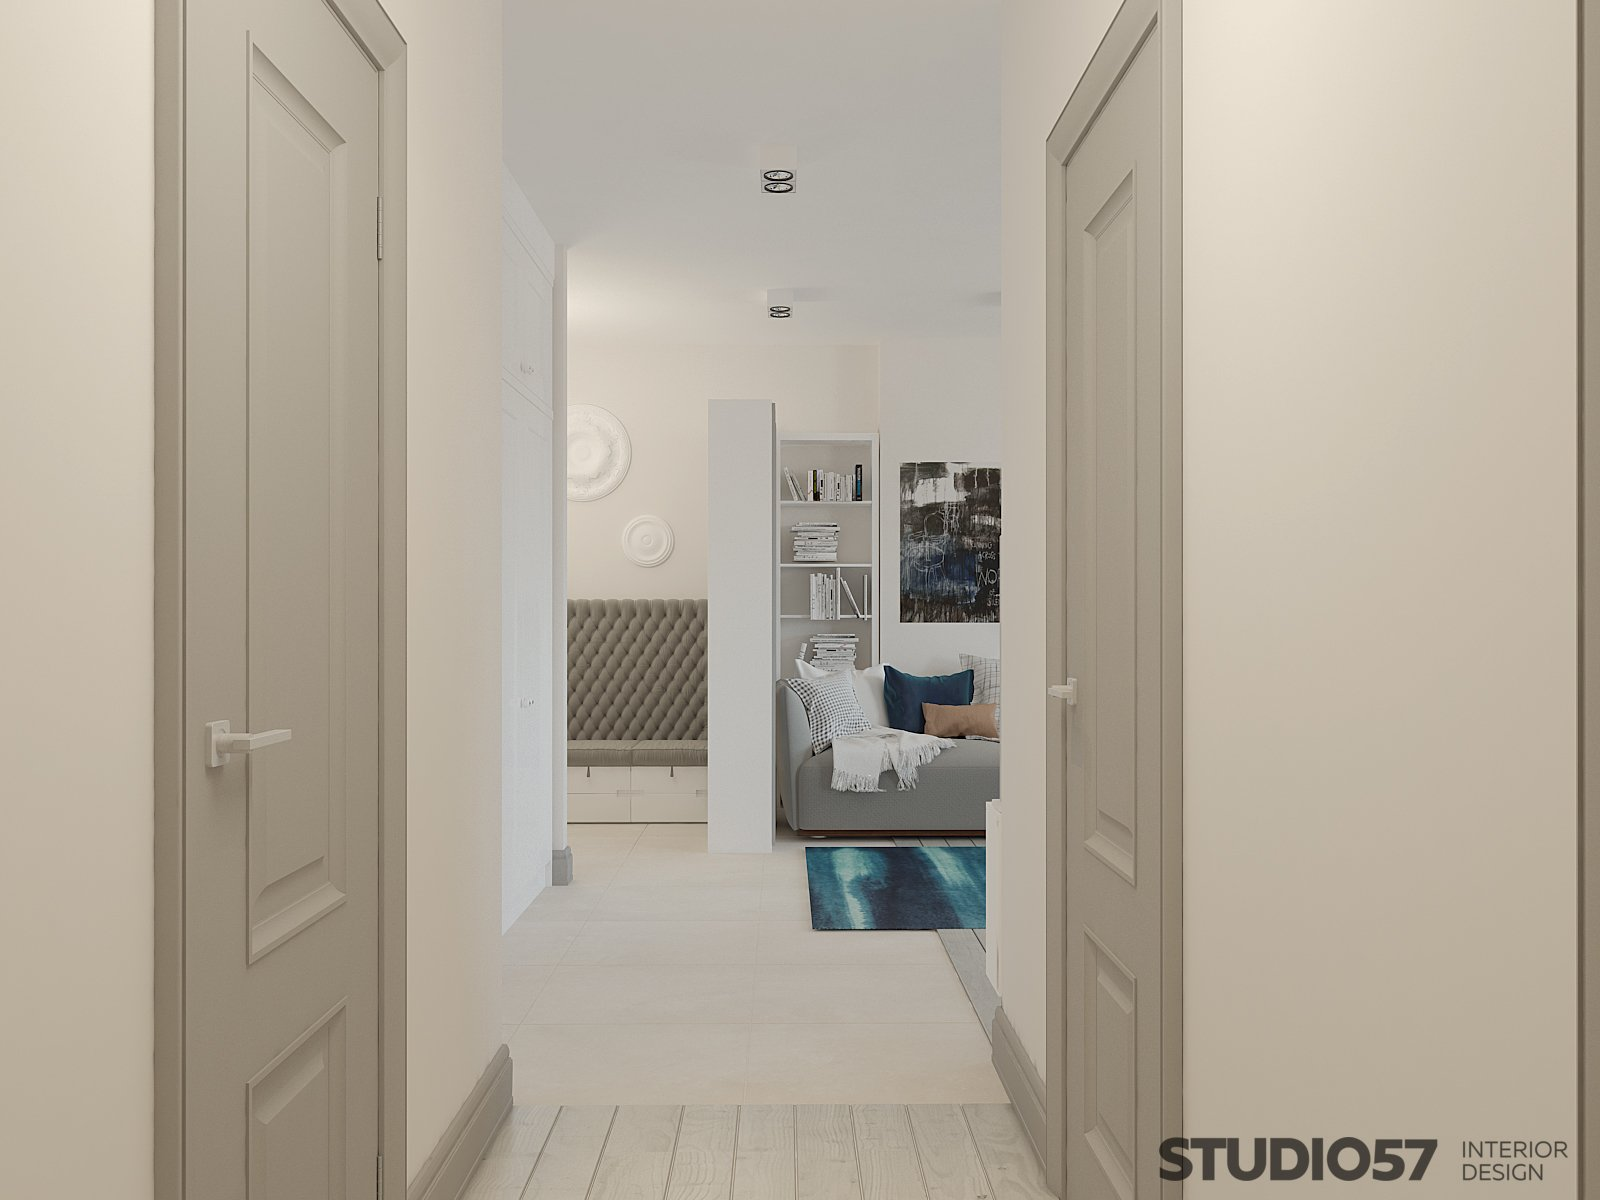 Corridor design photo